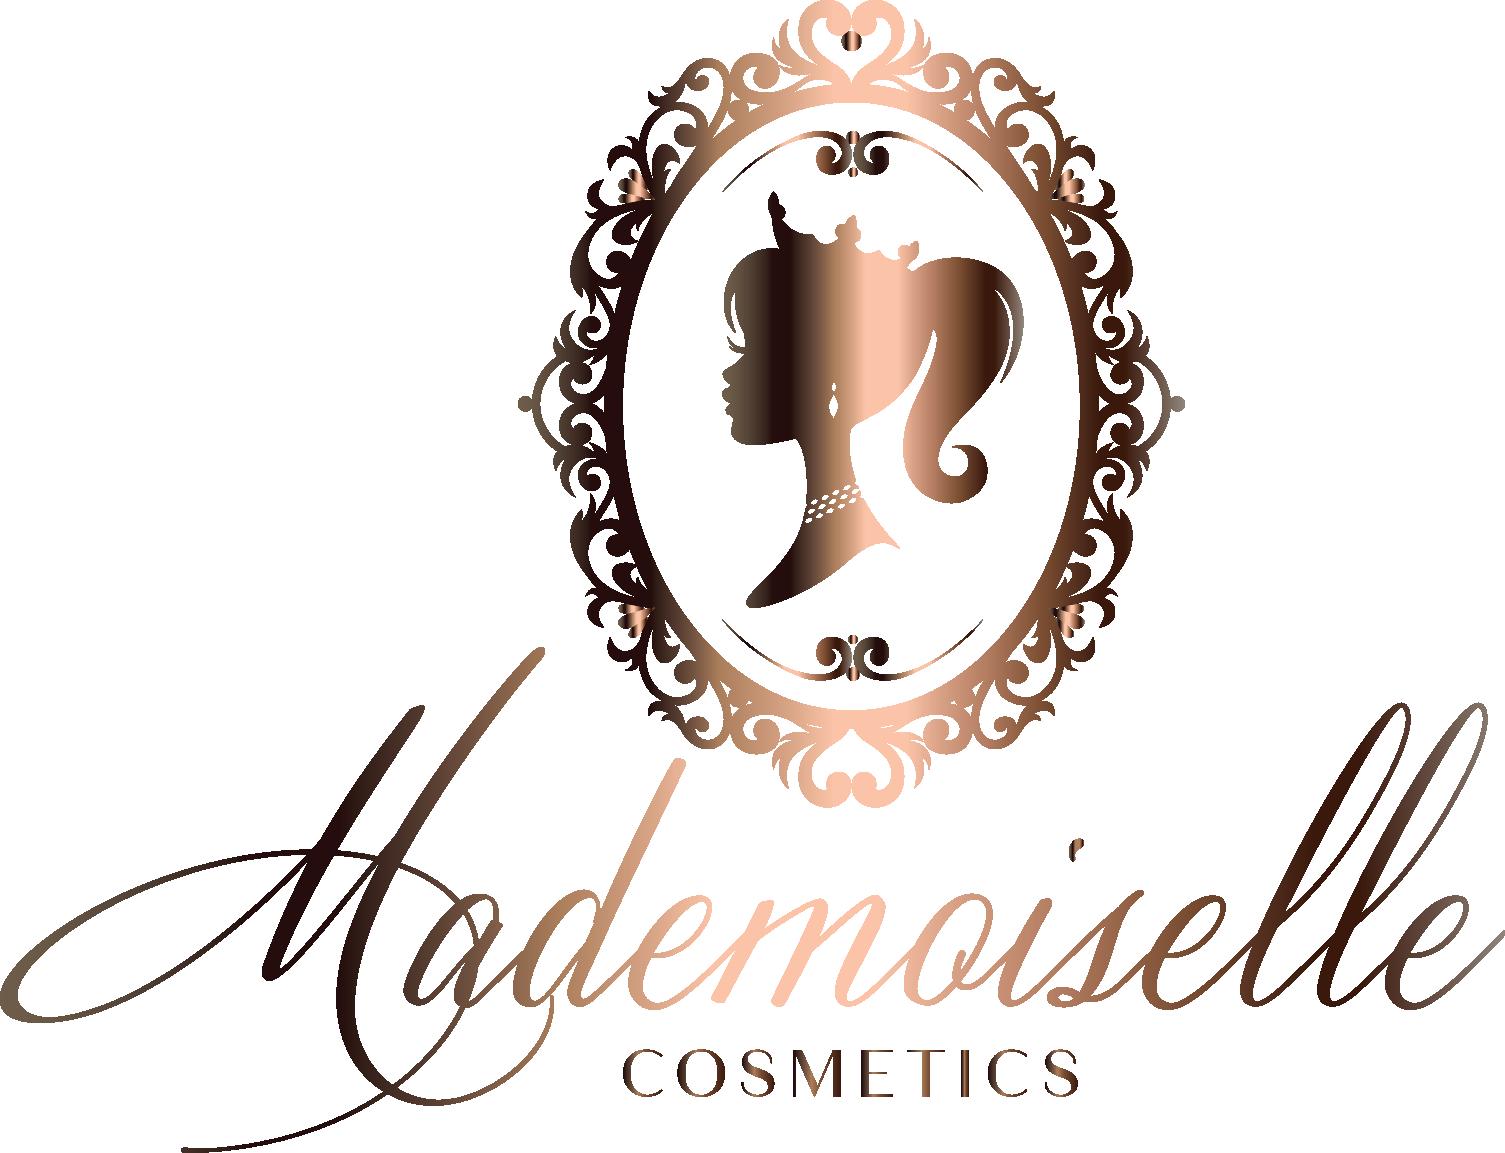 Mademoiselle Cosmetics Logo